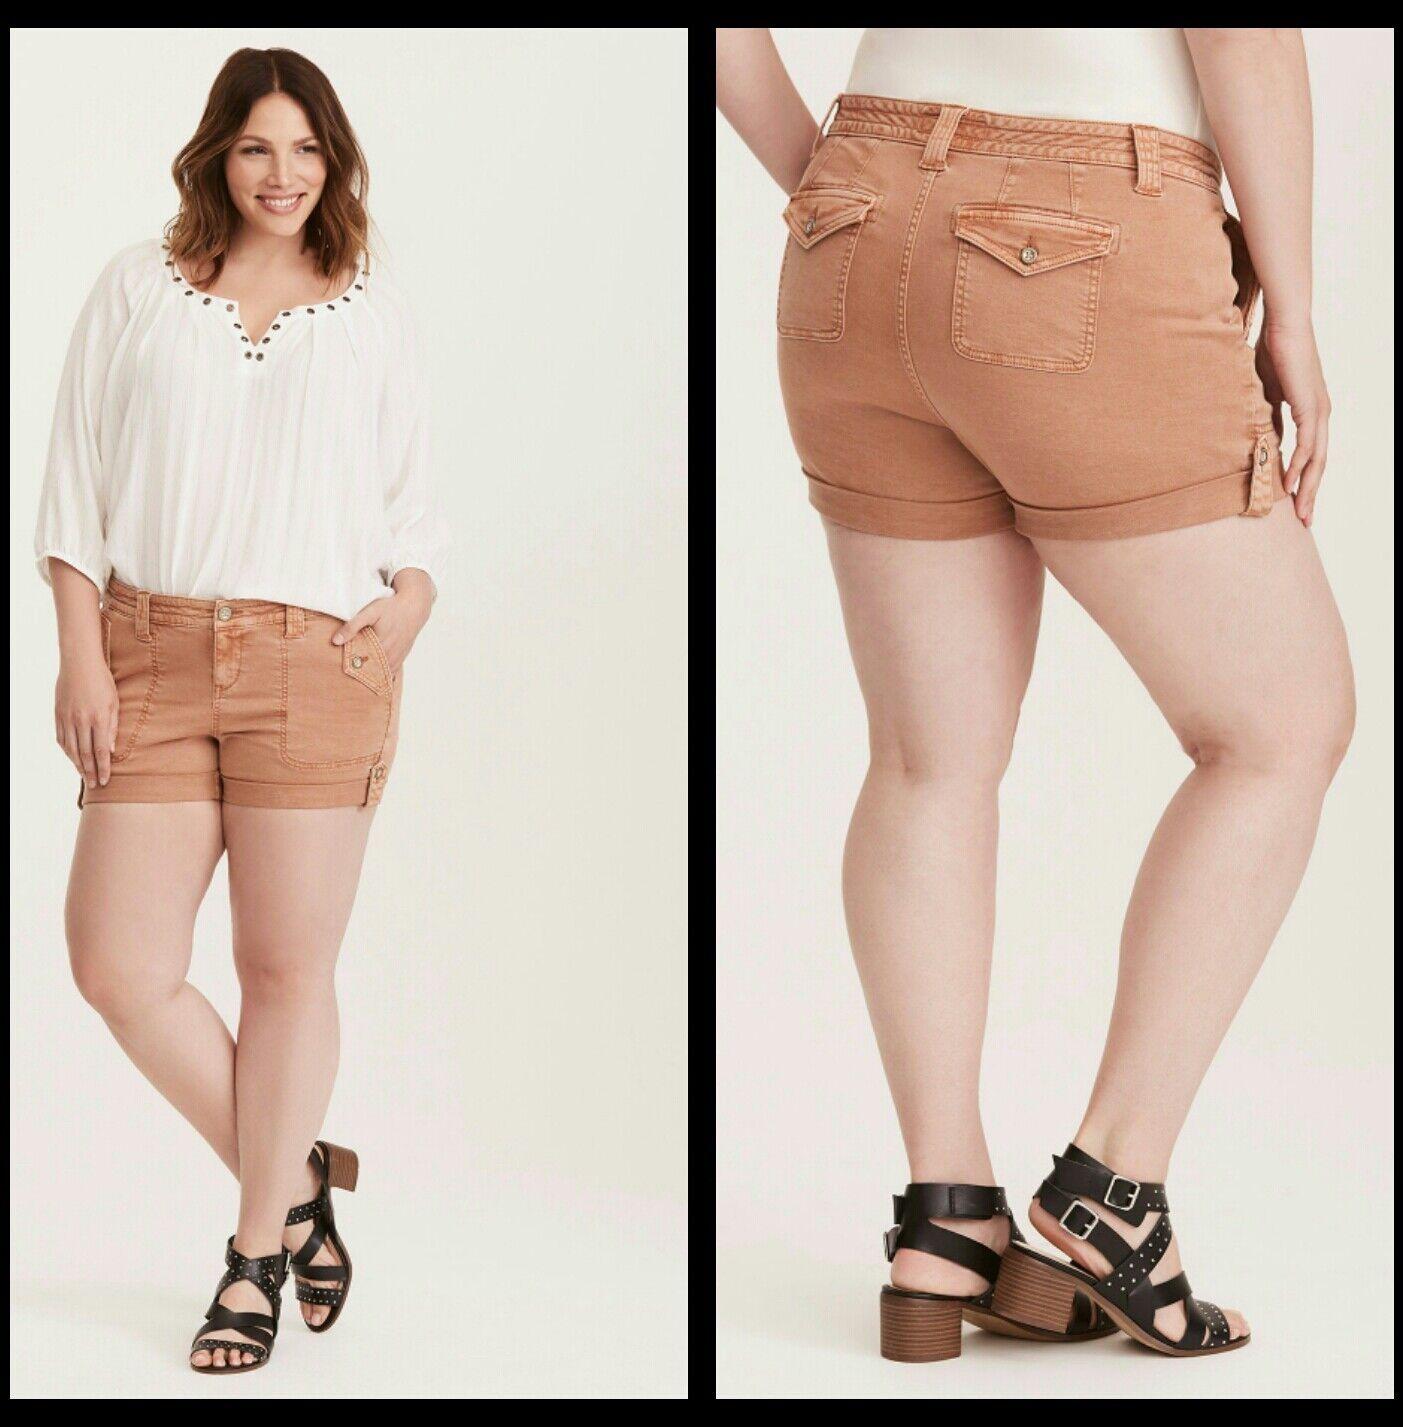 Torrid Plus Size 14 Military Short Shorts - Peach Wash (ZZ9)